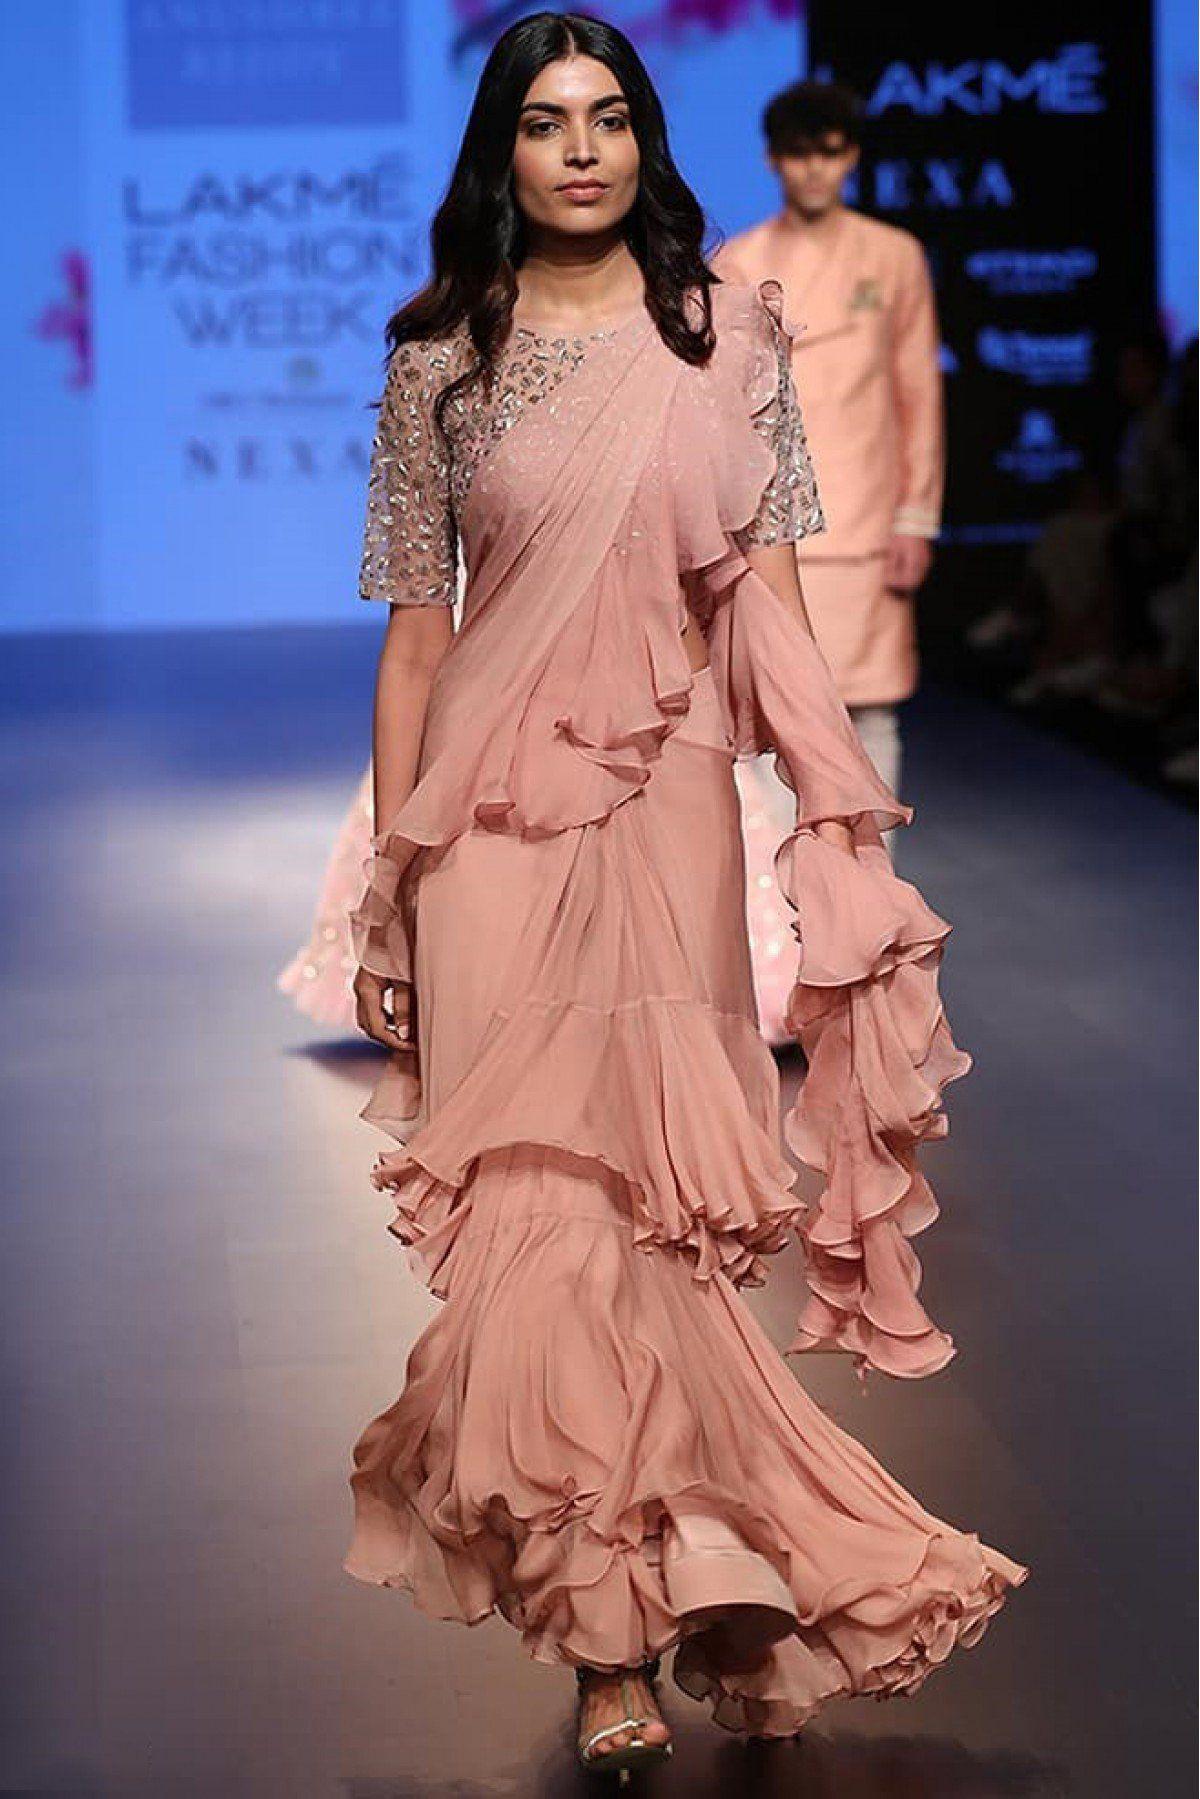 Youdesign Satin Georgette Multi Work Ruffle Saree In Pastel Peach Colour Stylish Sarees Saree Trends Saree Styles